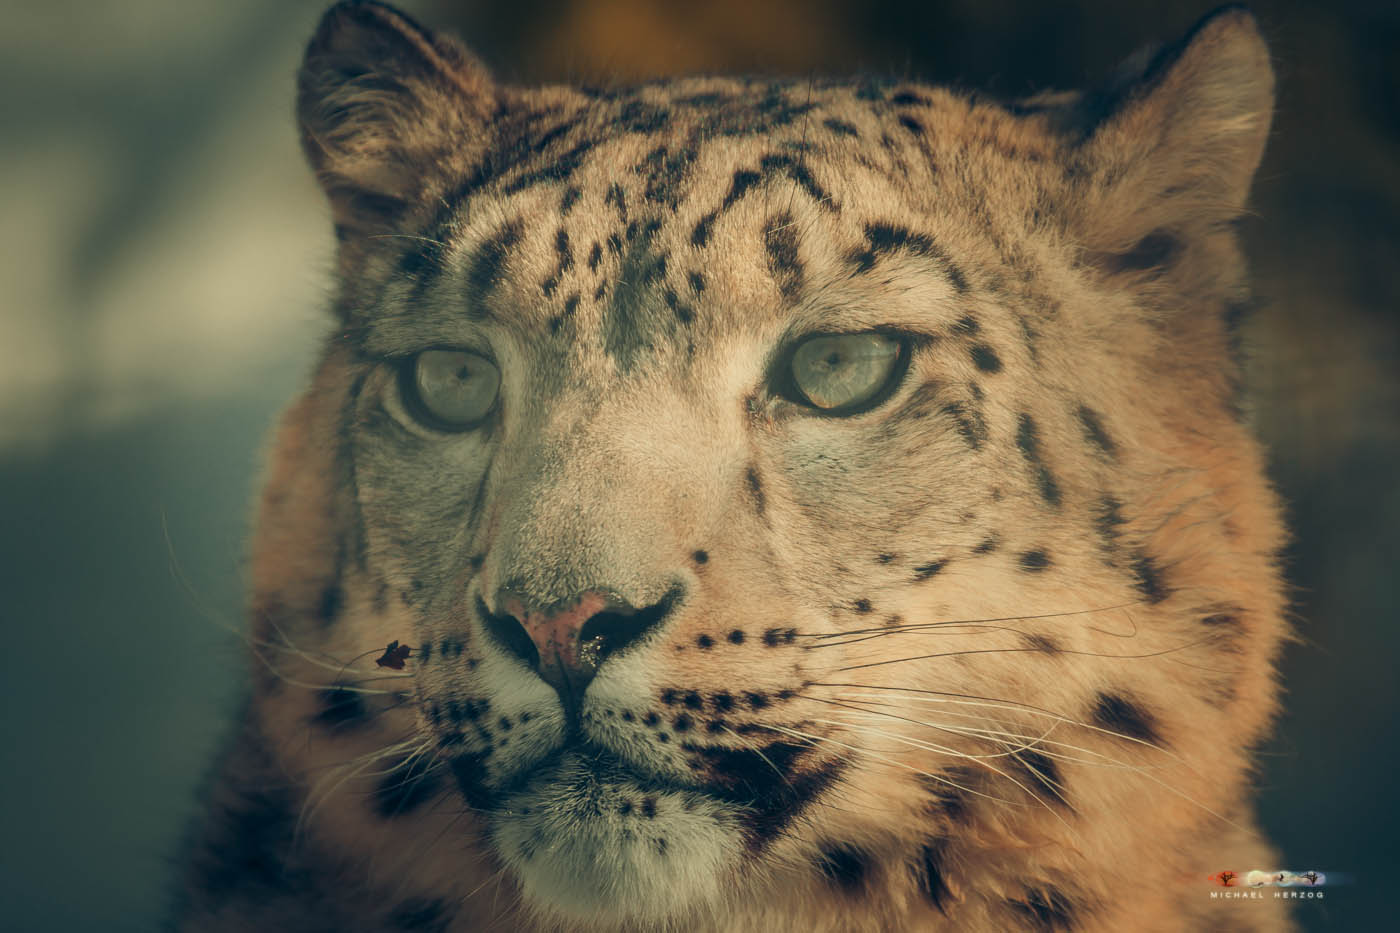 Zoo_Salzburg_MichaelHerzog-7557.jpg